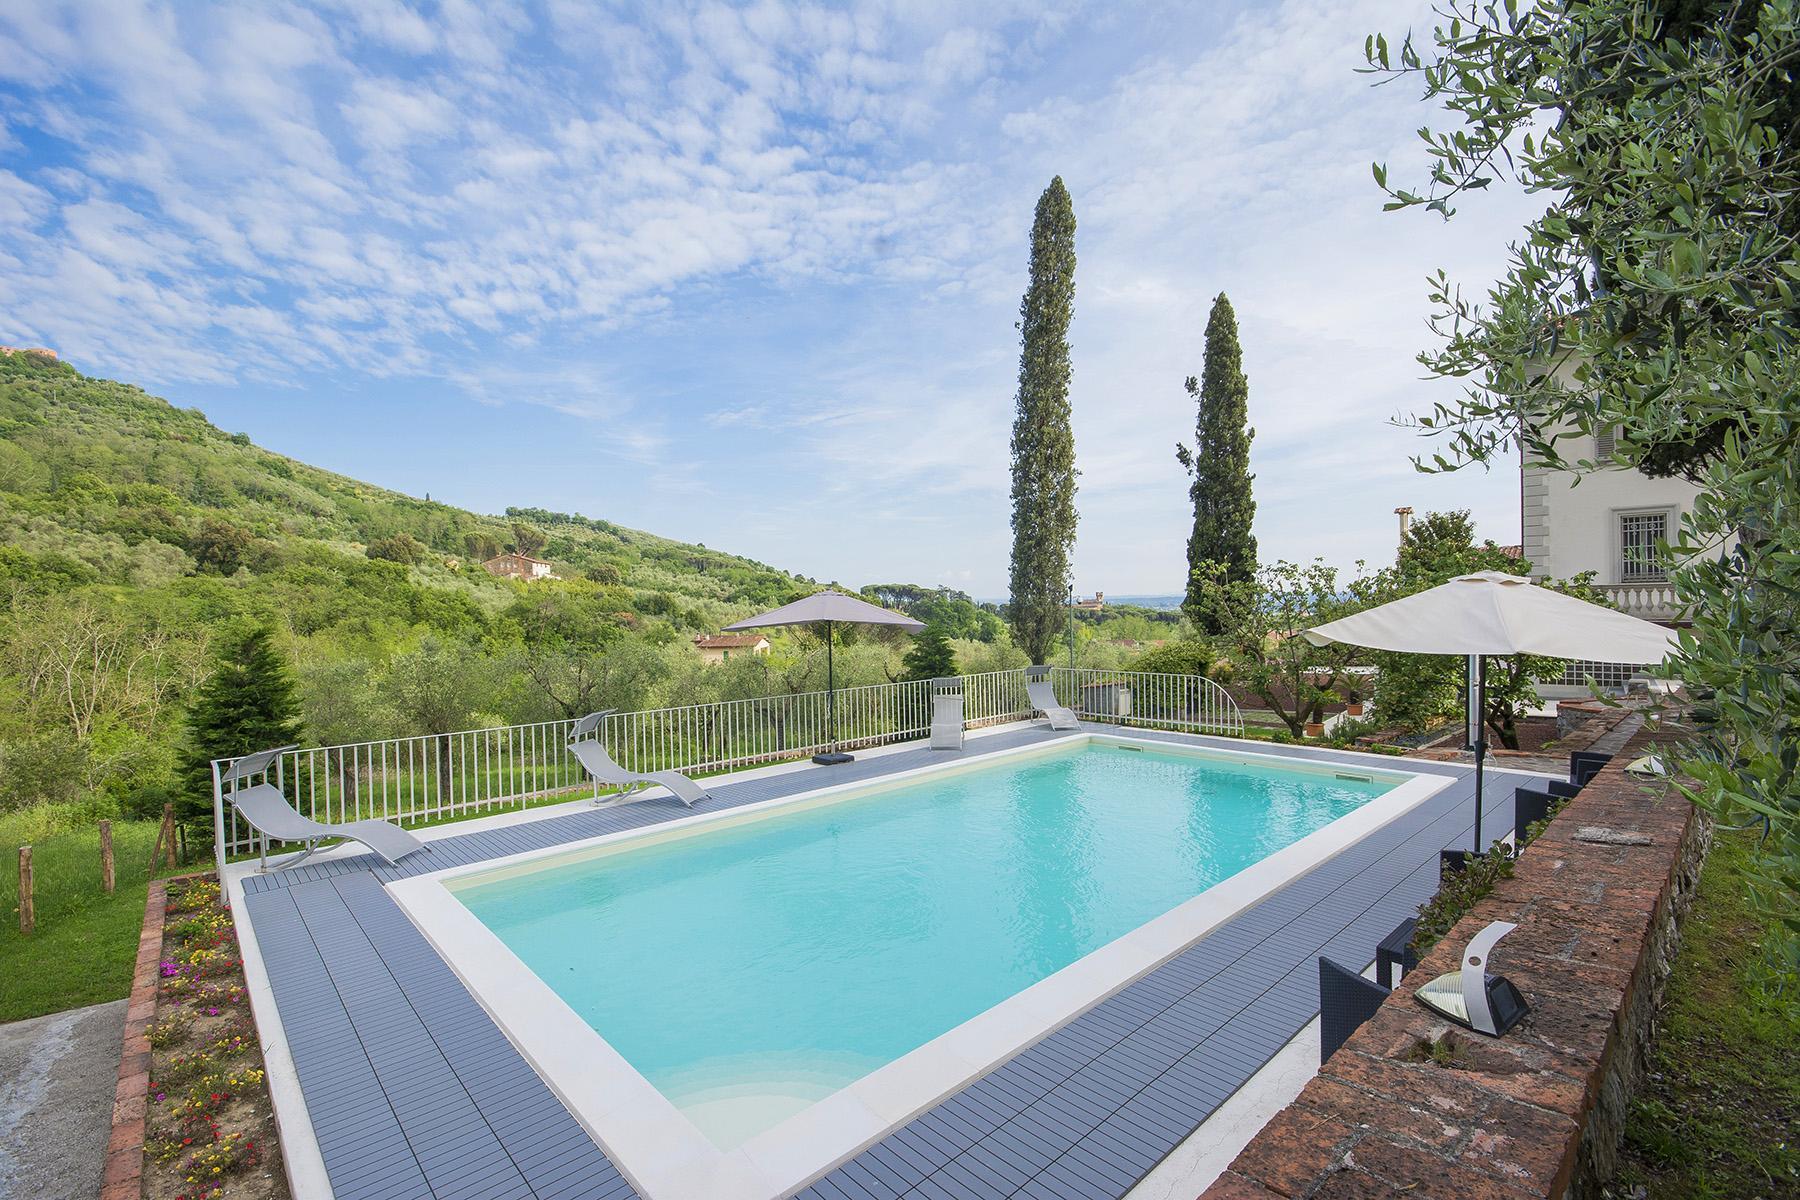 Montecatini Terme小镇优雅的新艺术风格的别墅 - 5